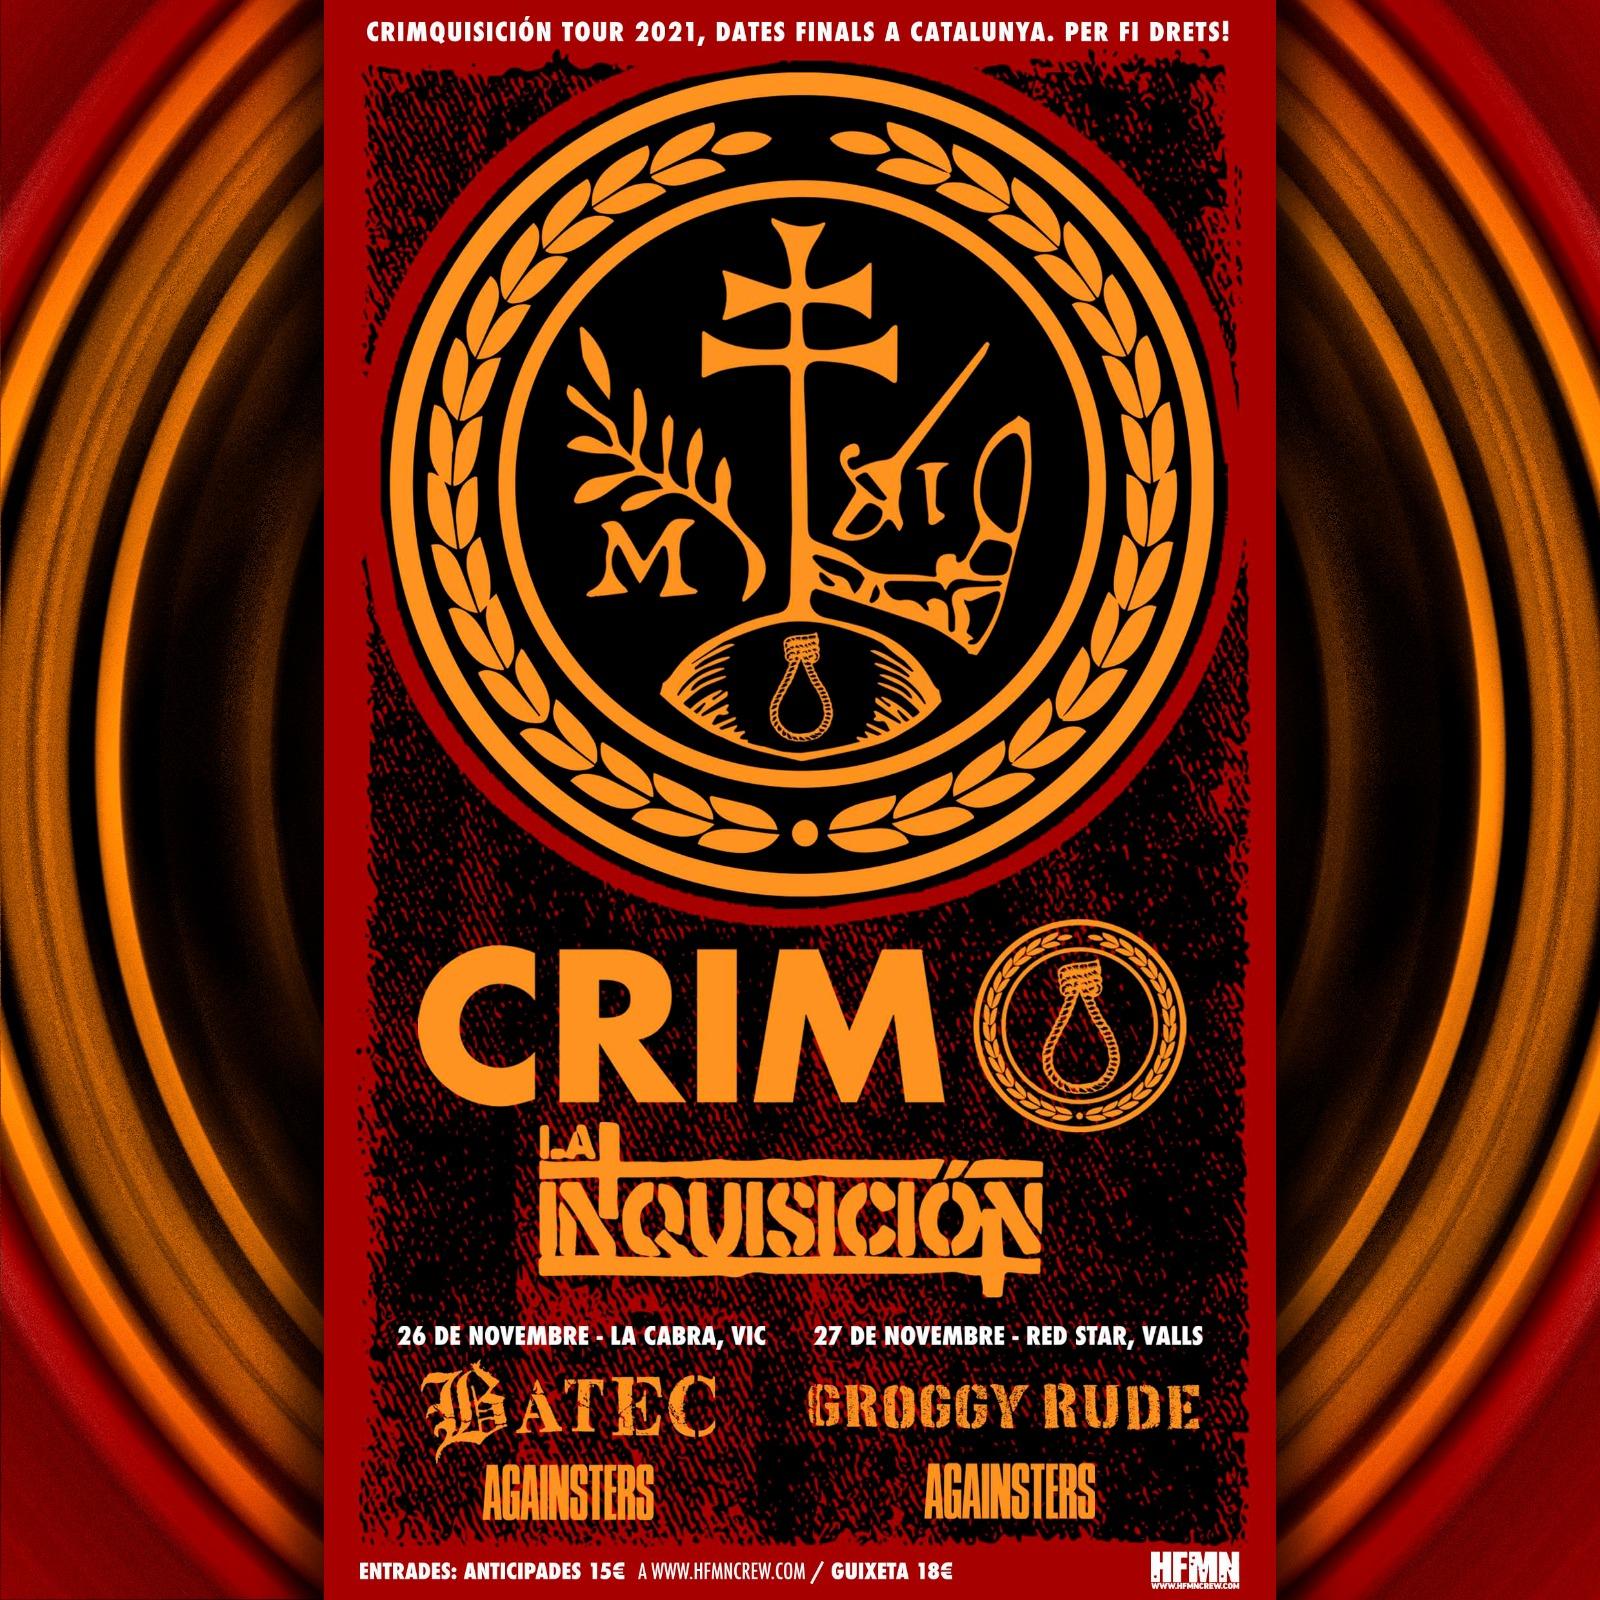 CRIM (Punk-Rock en catalá) - Página 5 FBkvZmUXoAgzR4j?format=jpg&name=large